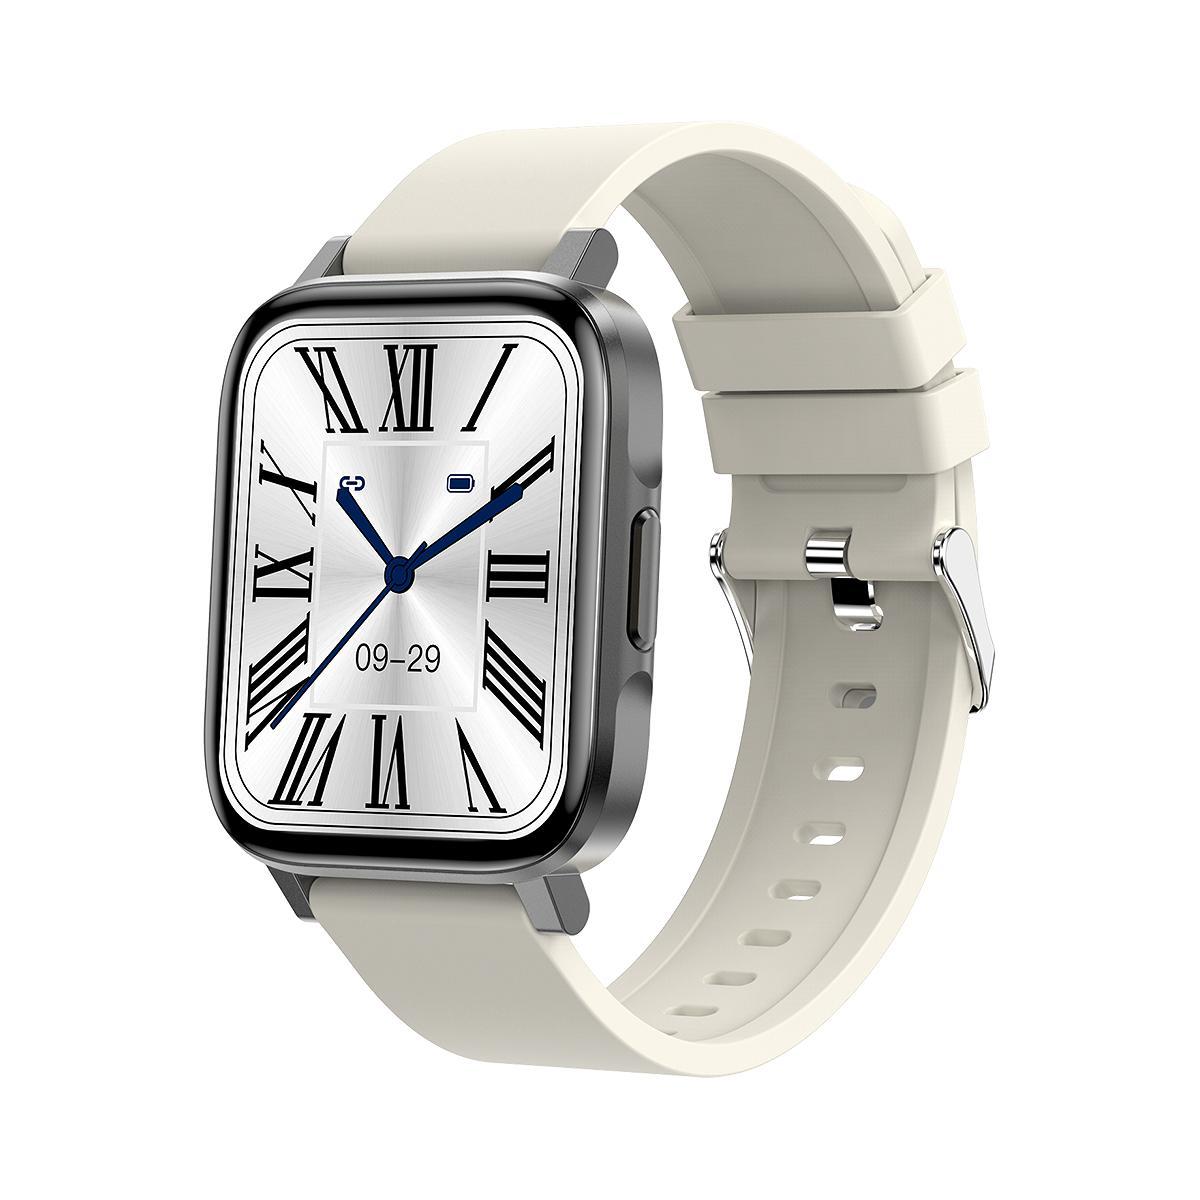 G51 local music palyer digital smart watch 4